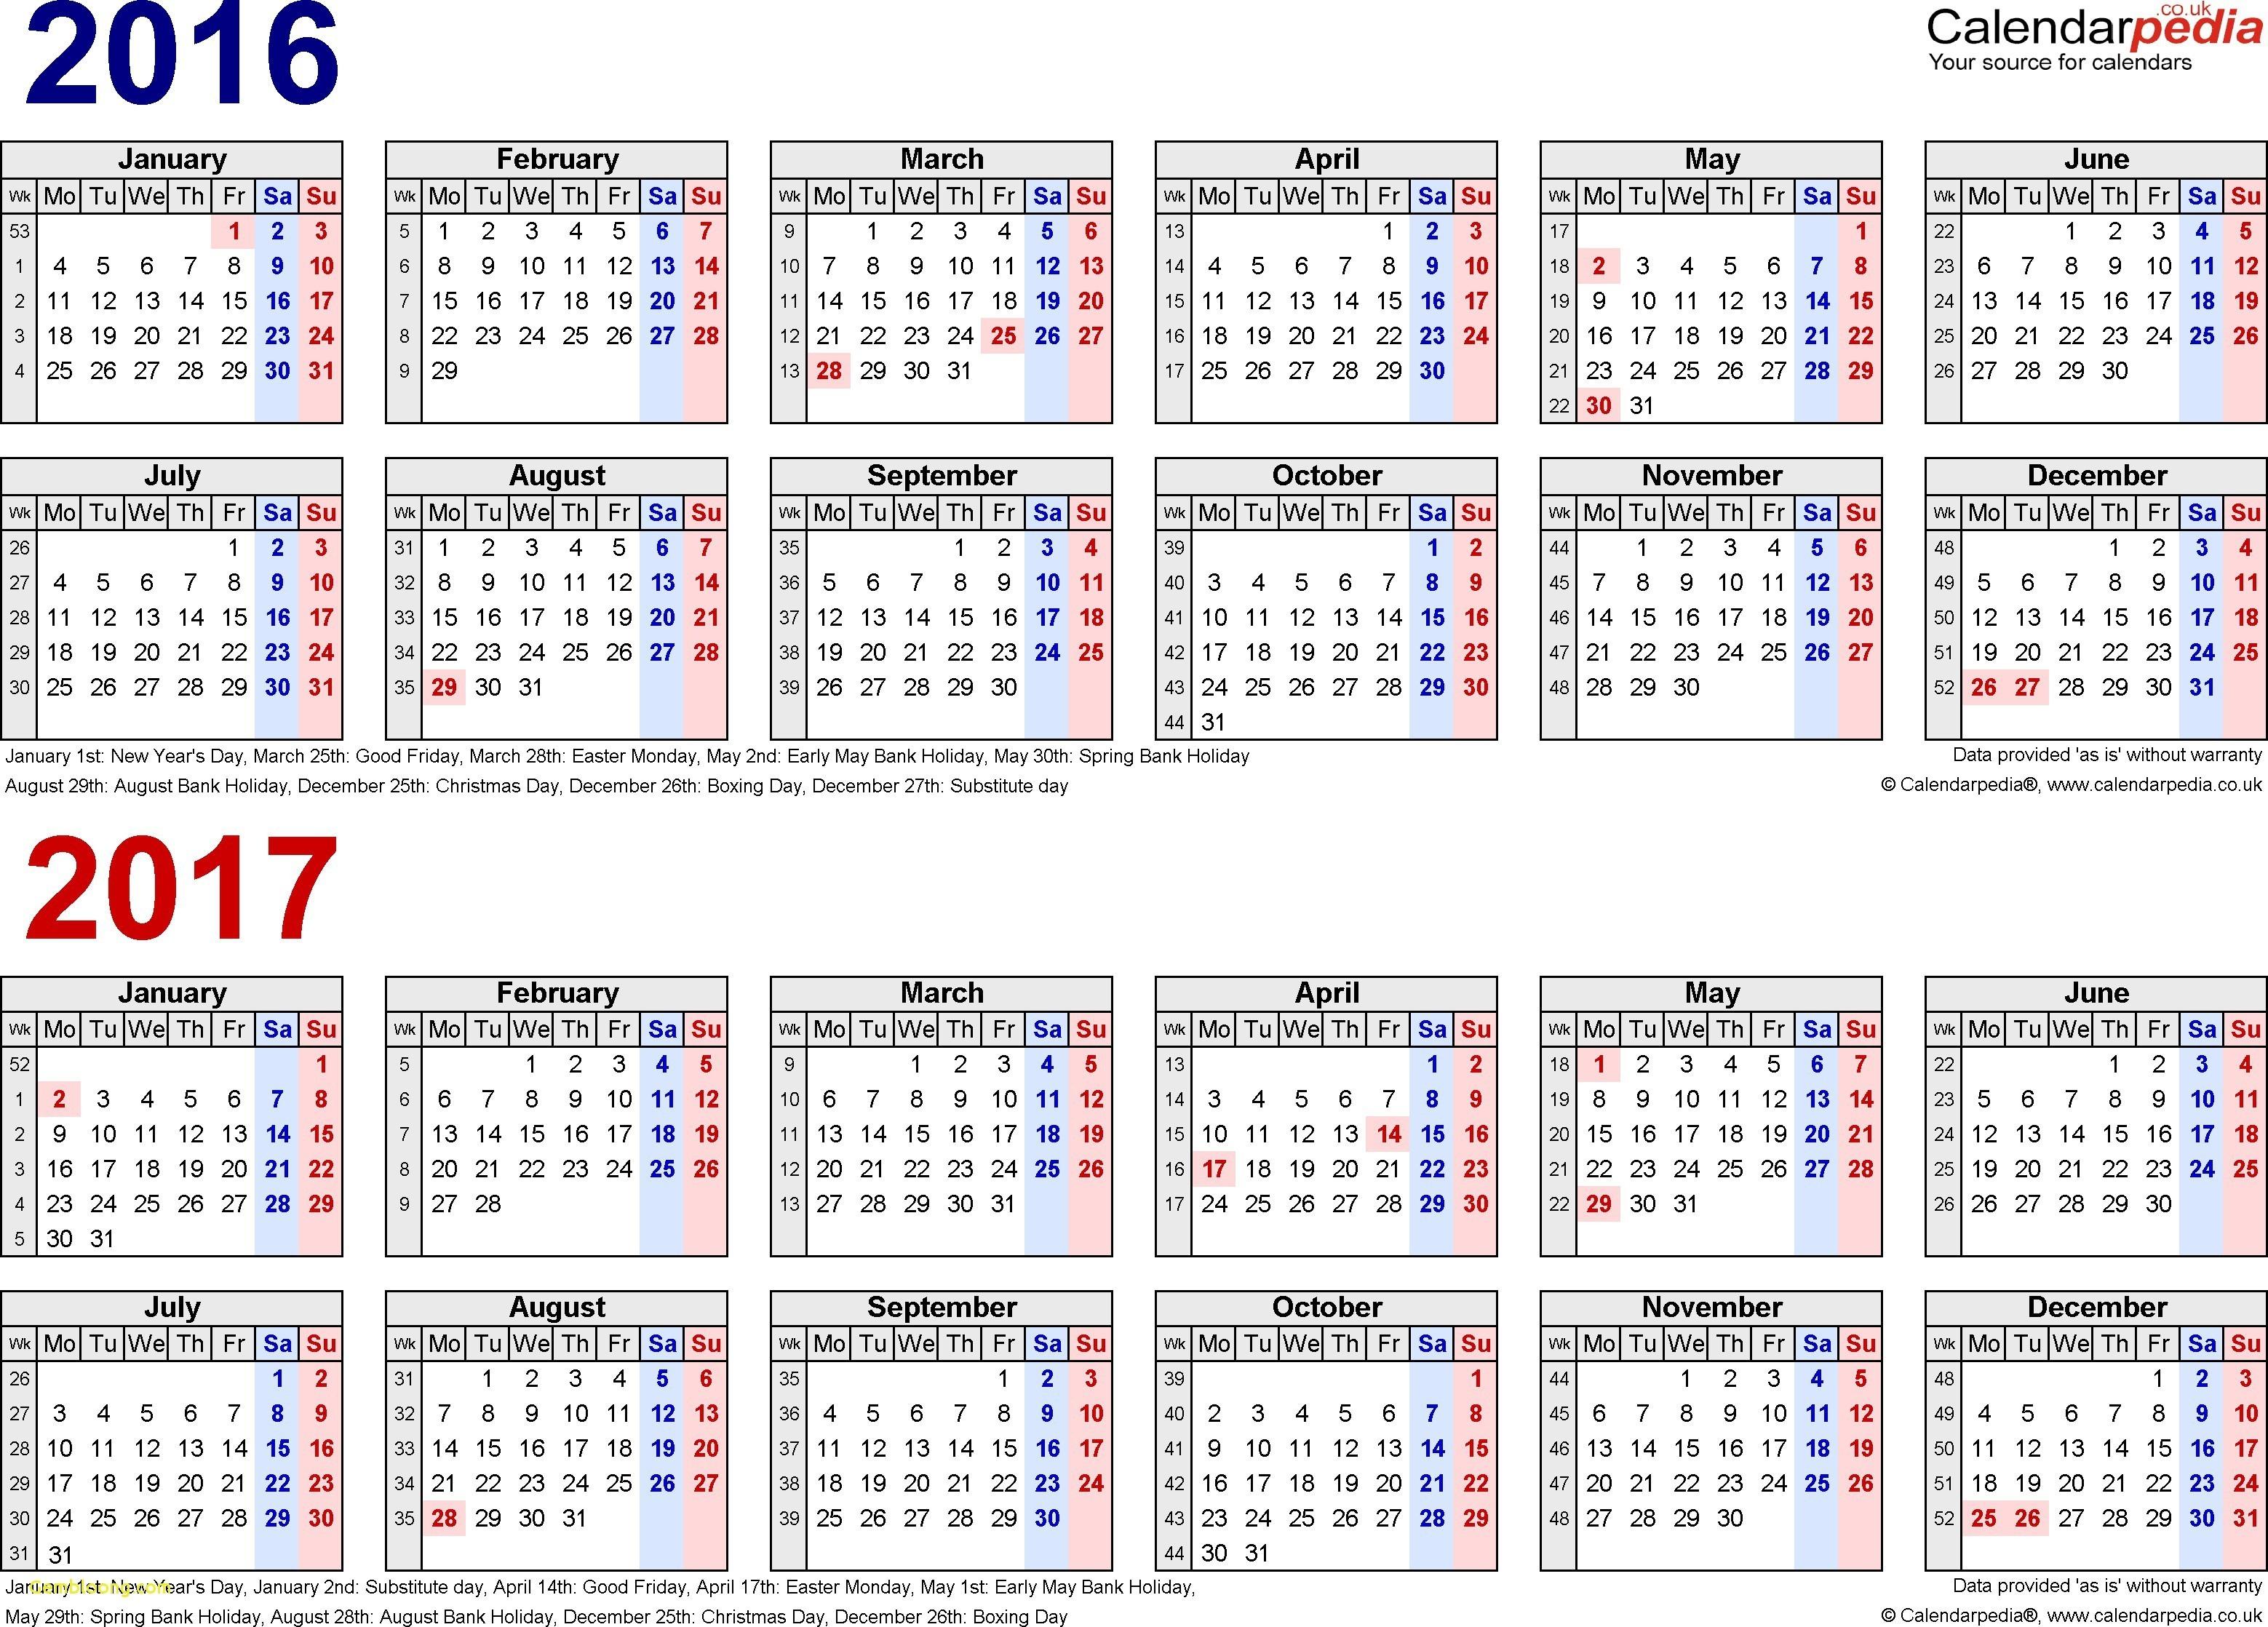 Ms Excel Calendar 2019 Lunar Calendar 2019 Conversion Ms Excel Calendar 2019 Wedding Planner Calendar